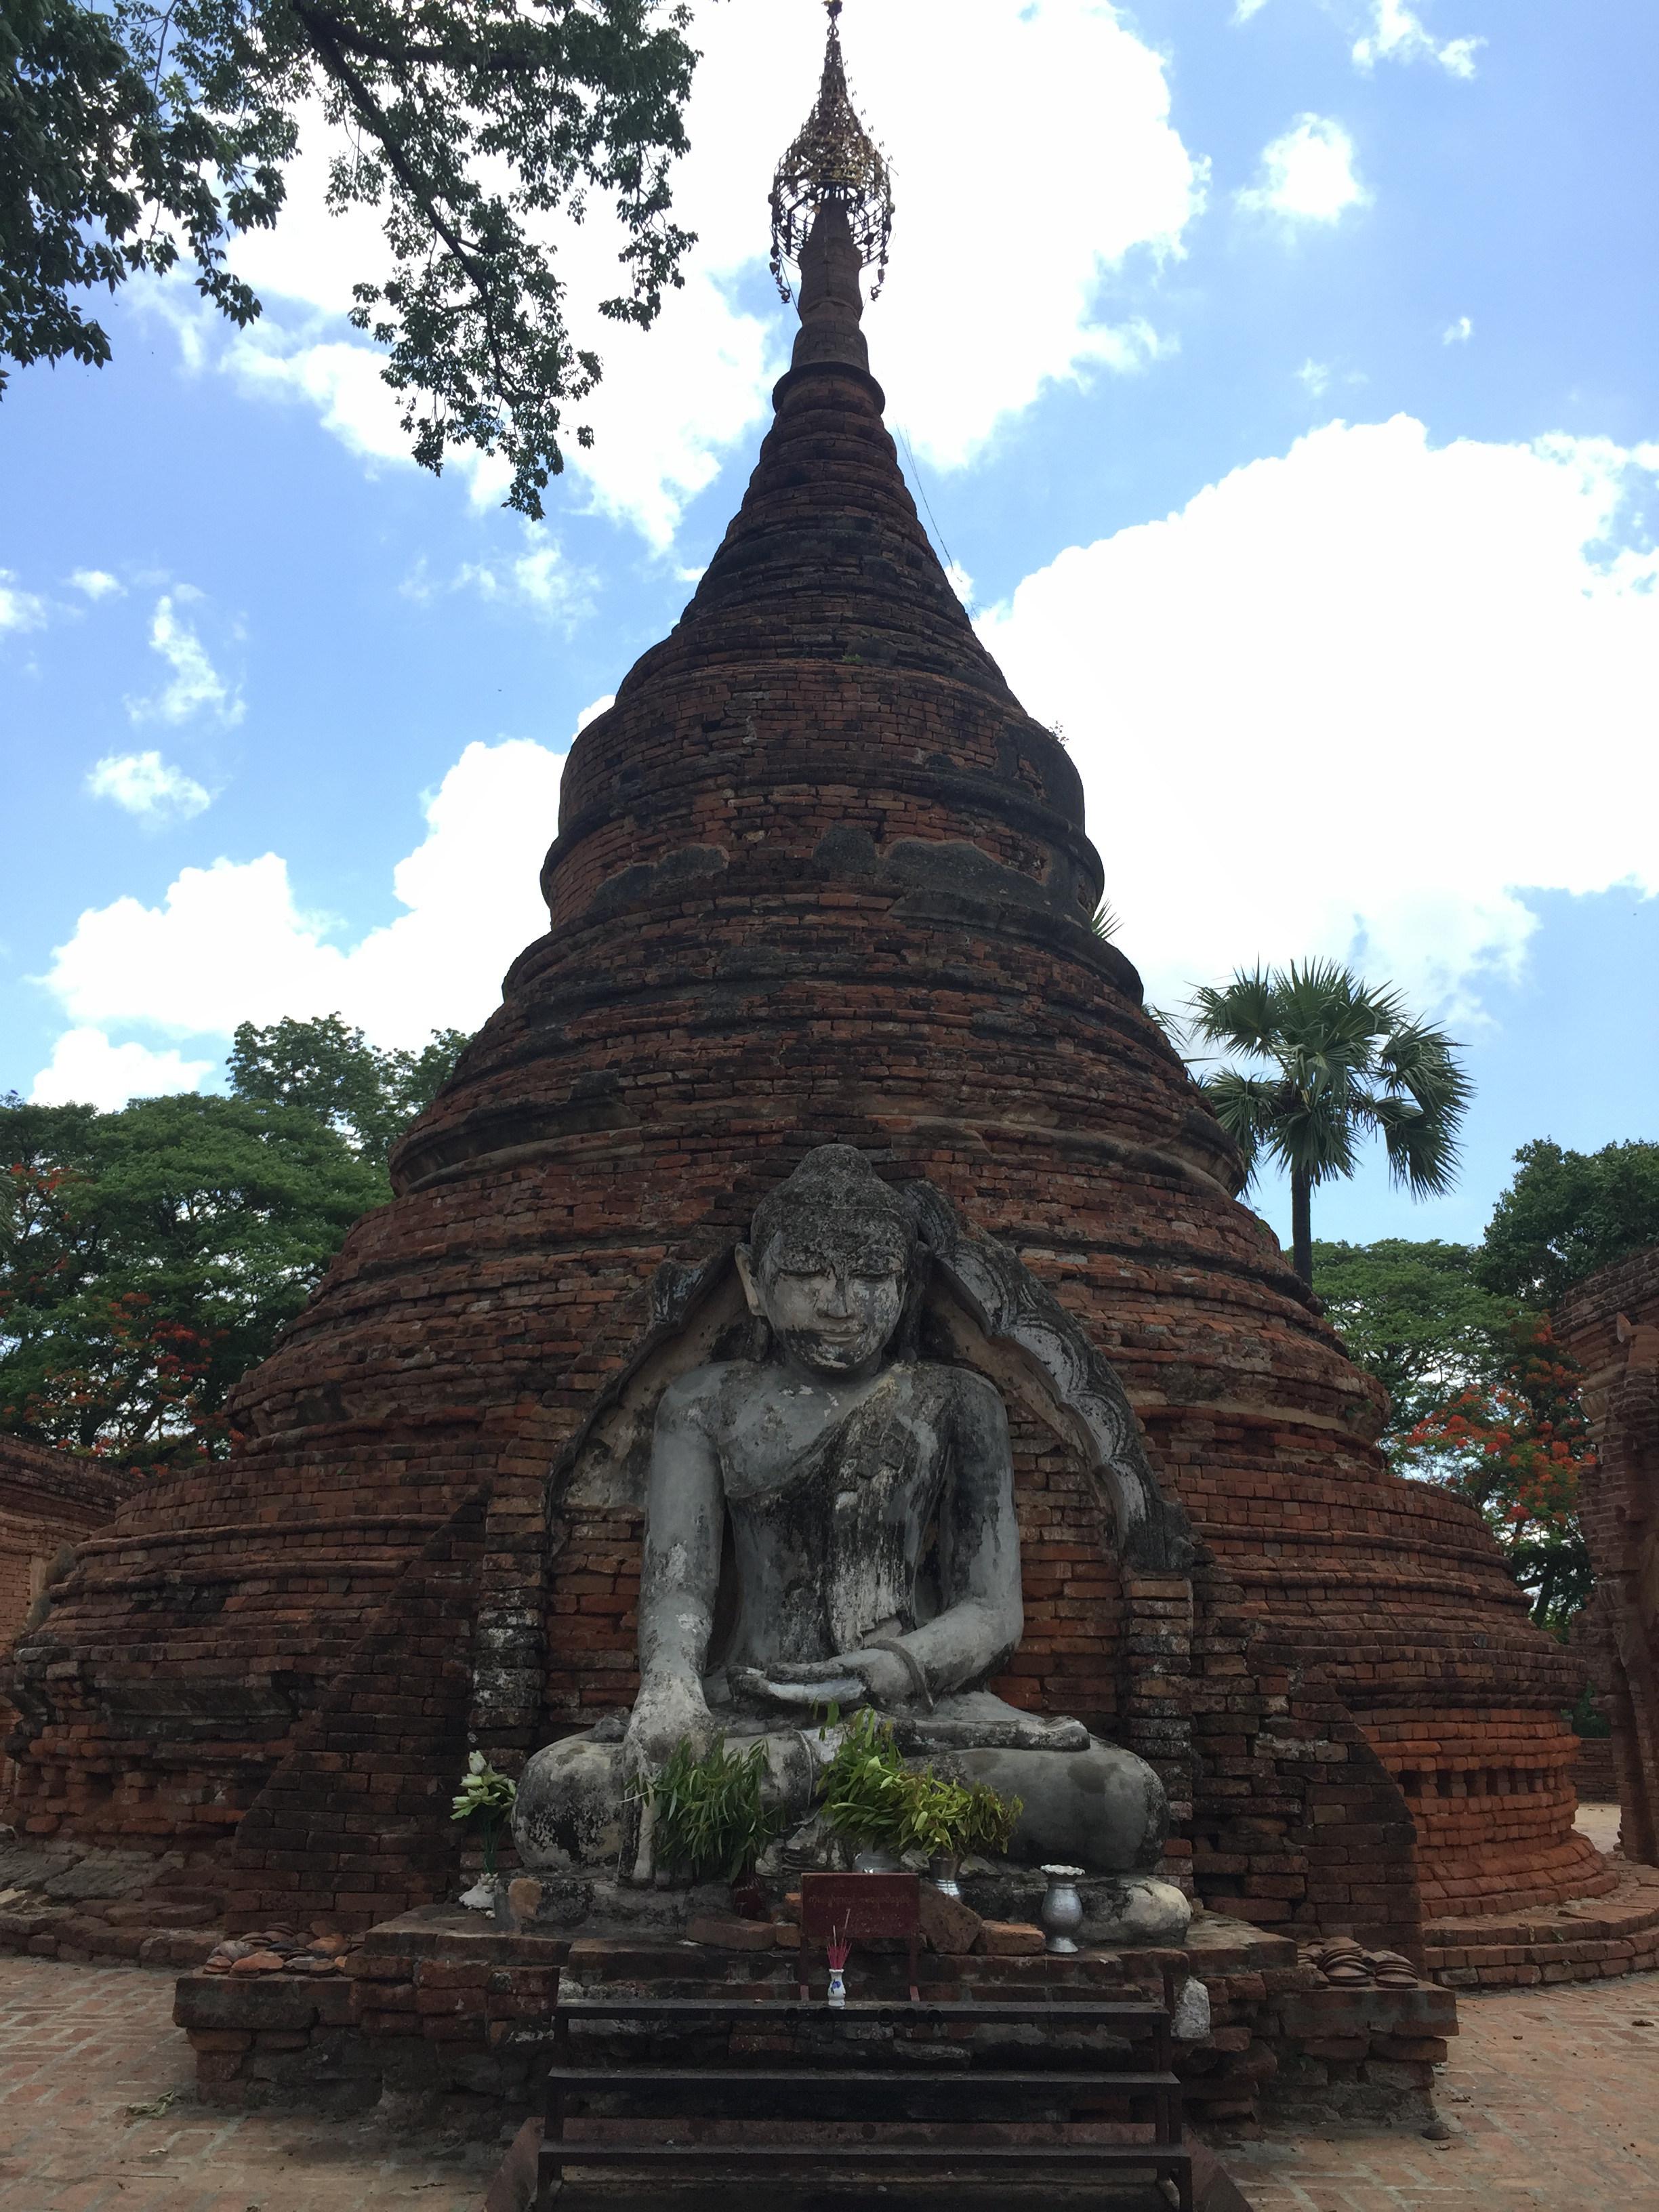 Alamy Daw Gyan pagoda complex, Ava (Inwa), Myanmar